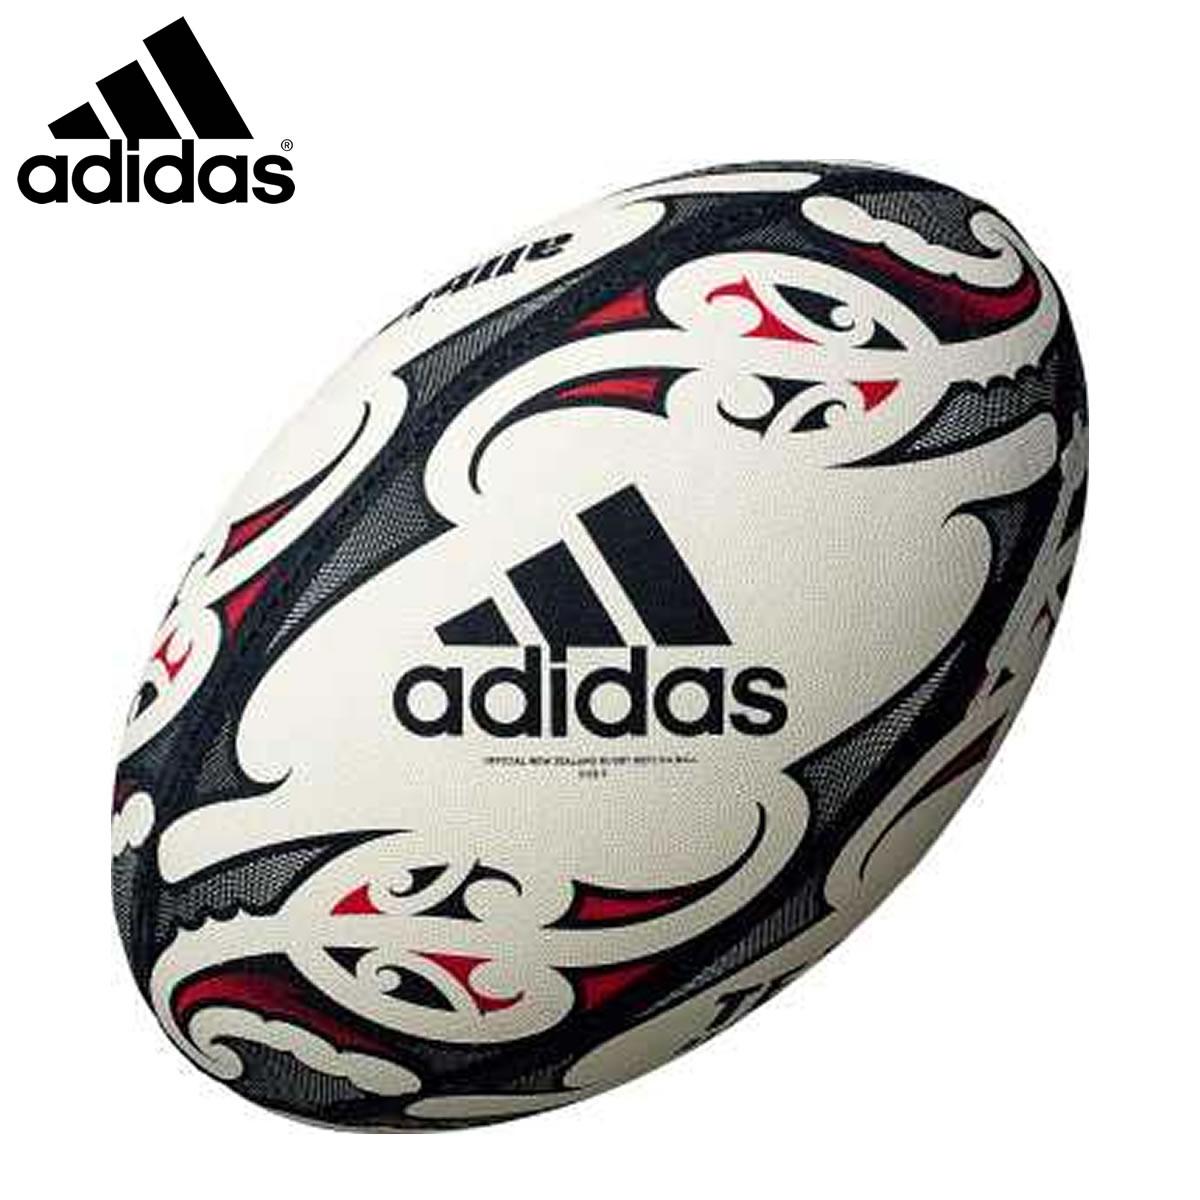 adidas AR535AB 爆売り オールブラックス レプリカ 取り寄せ ラグビーボール 2021 驚きの値段で アディダス